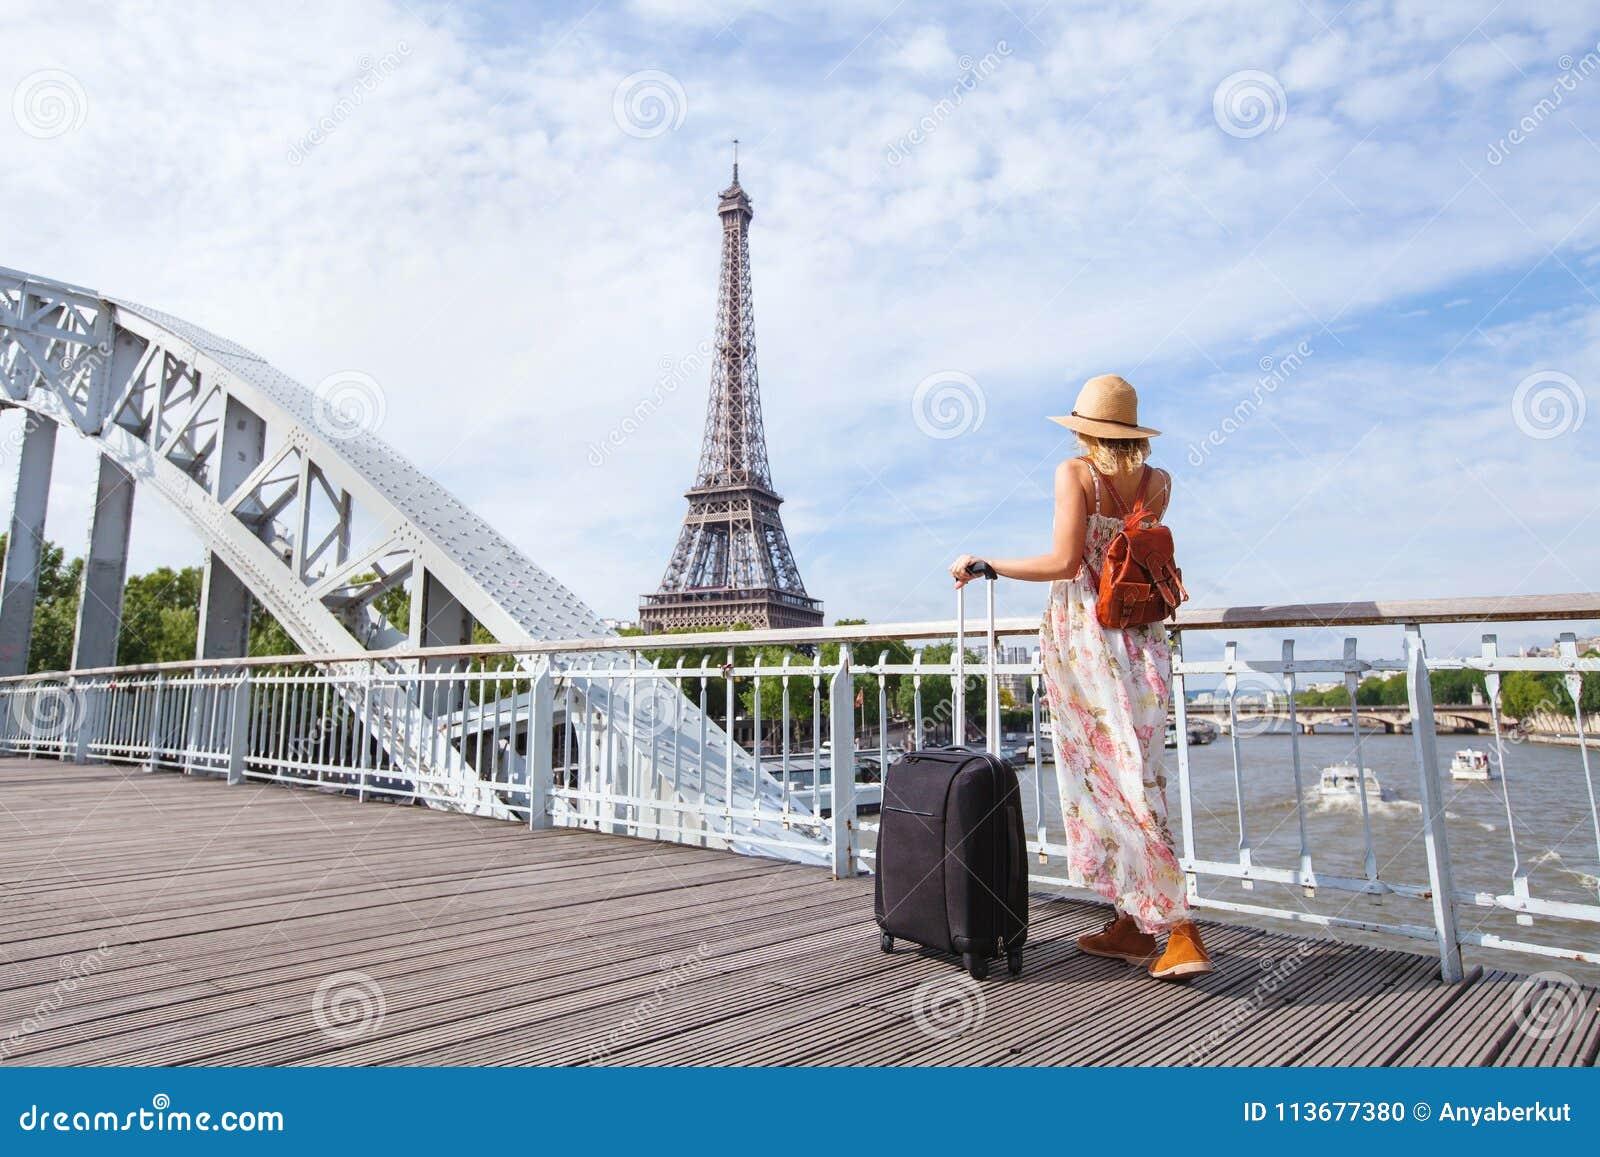 Travel to Paris, Europe tour, woman with suitcase near Eiffel Tower